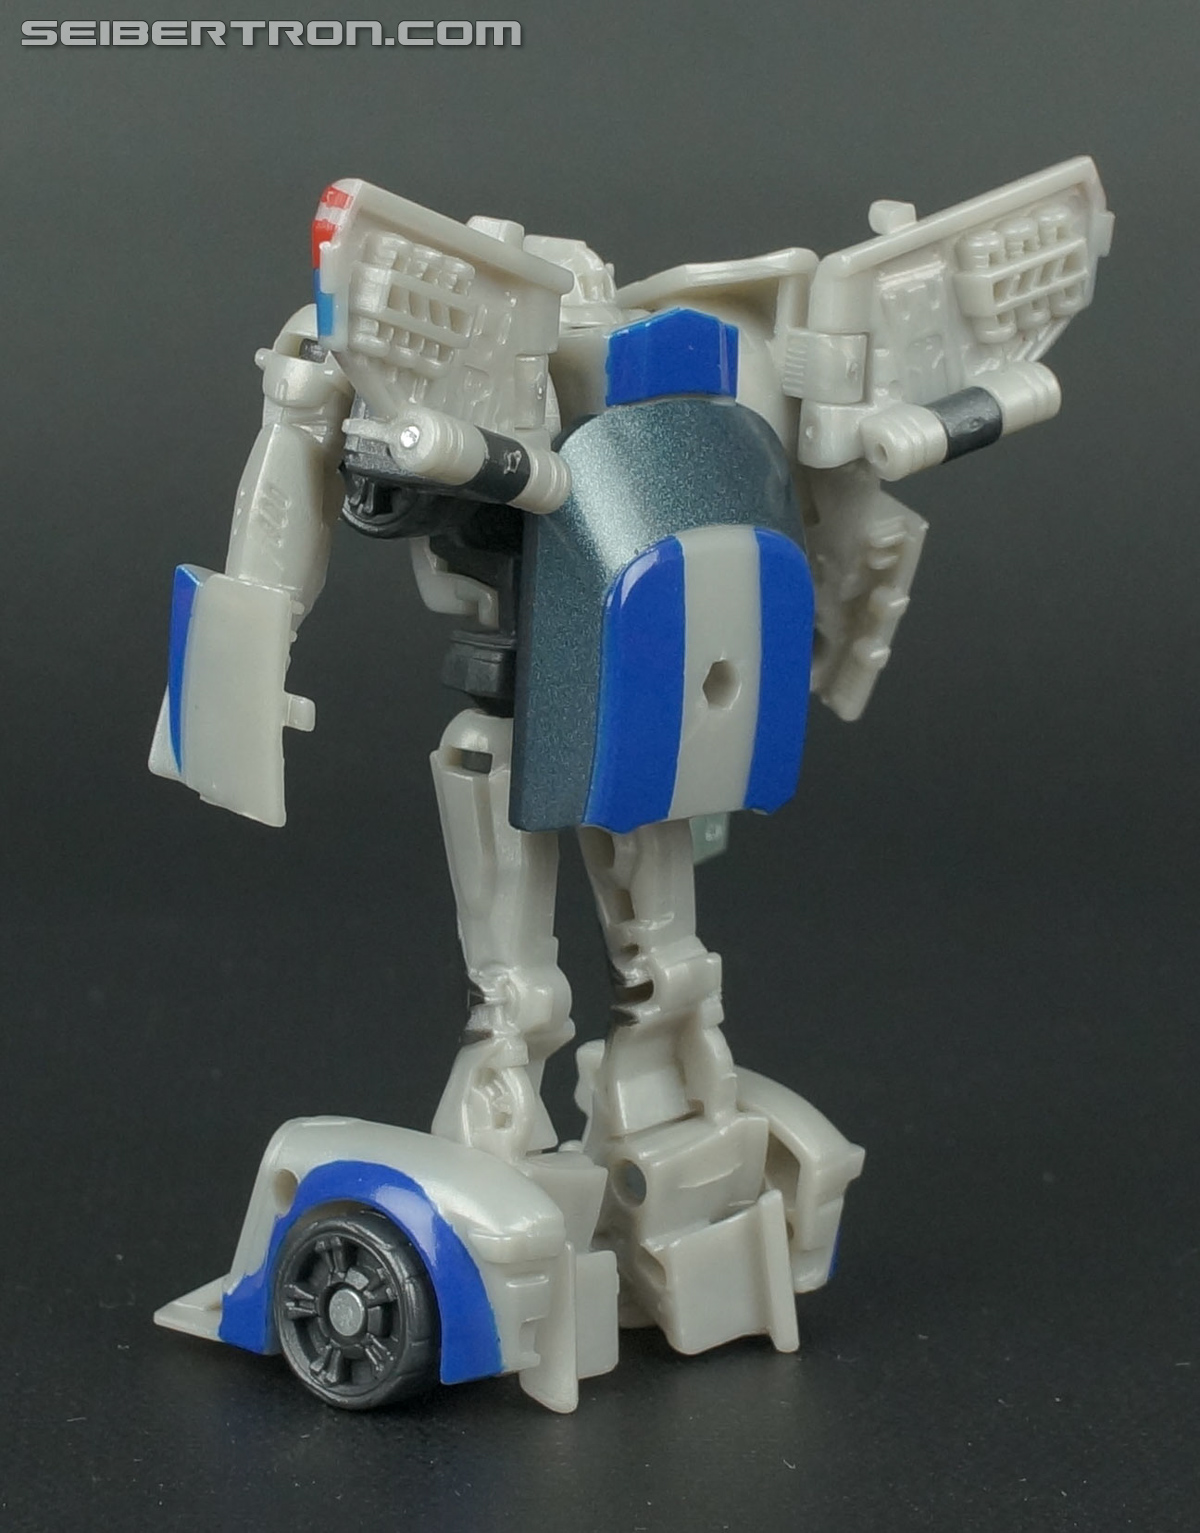 Transformers Prime Beast Hunters Cyberverse Smokescreen (Image #56 of 93)